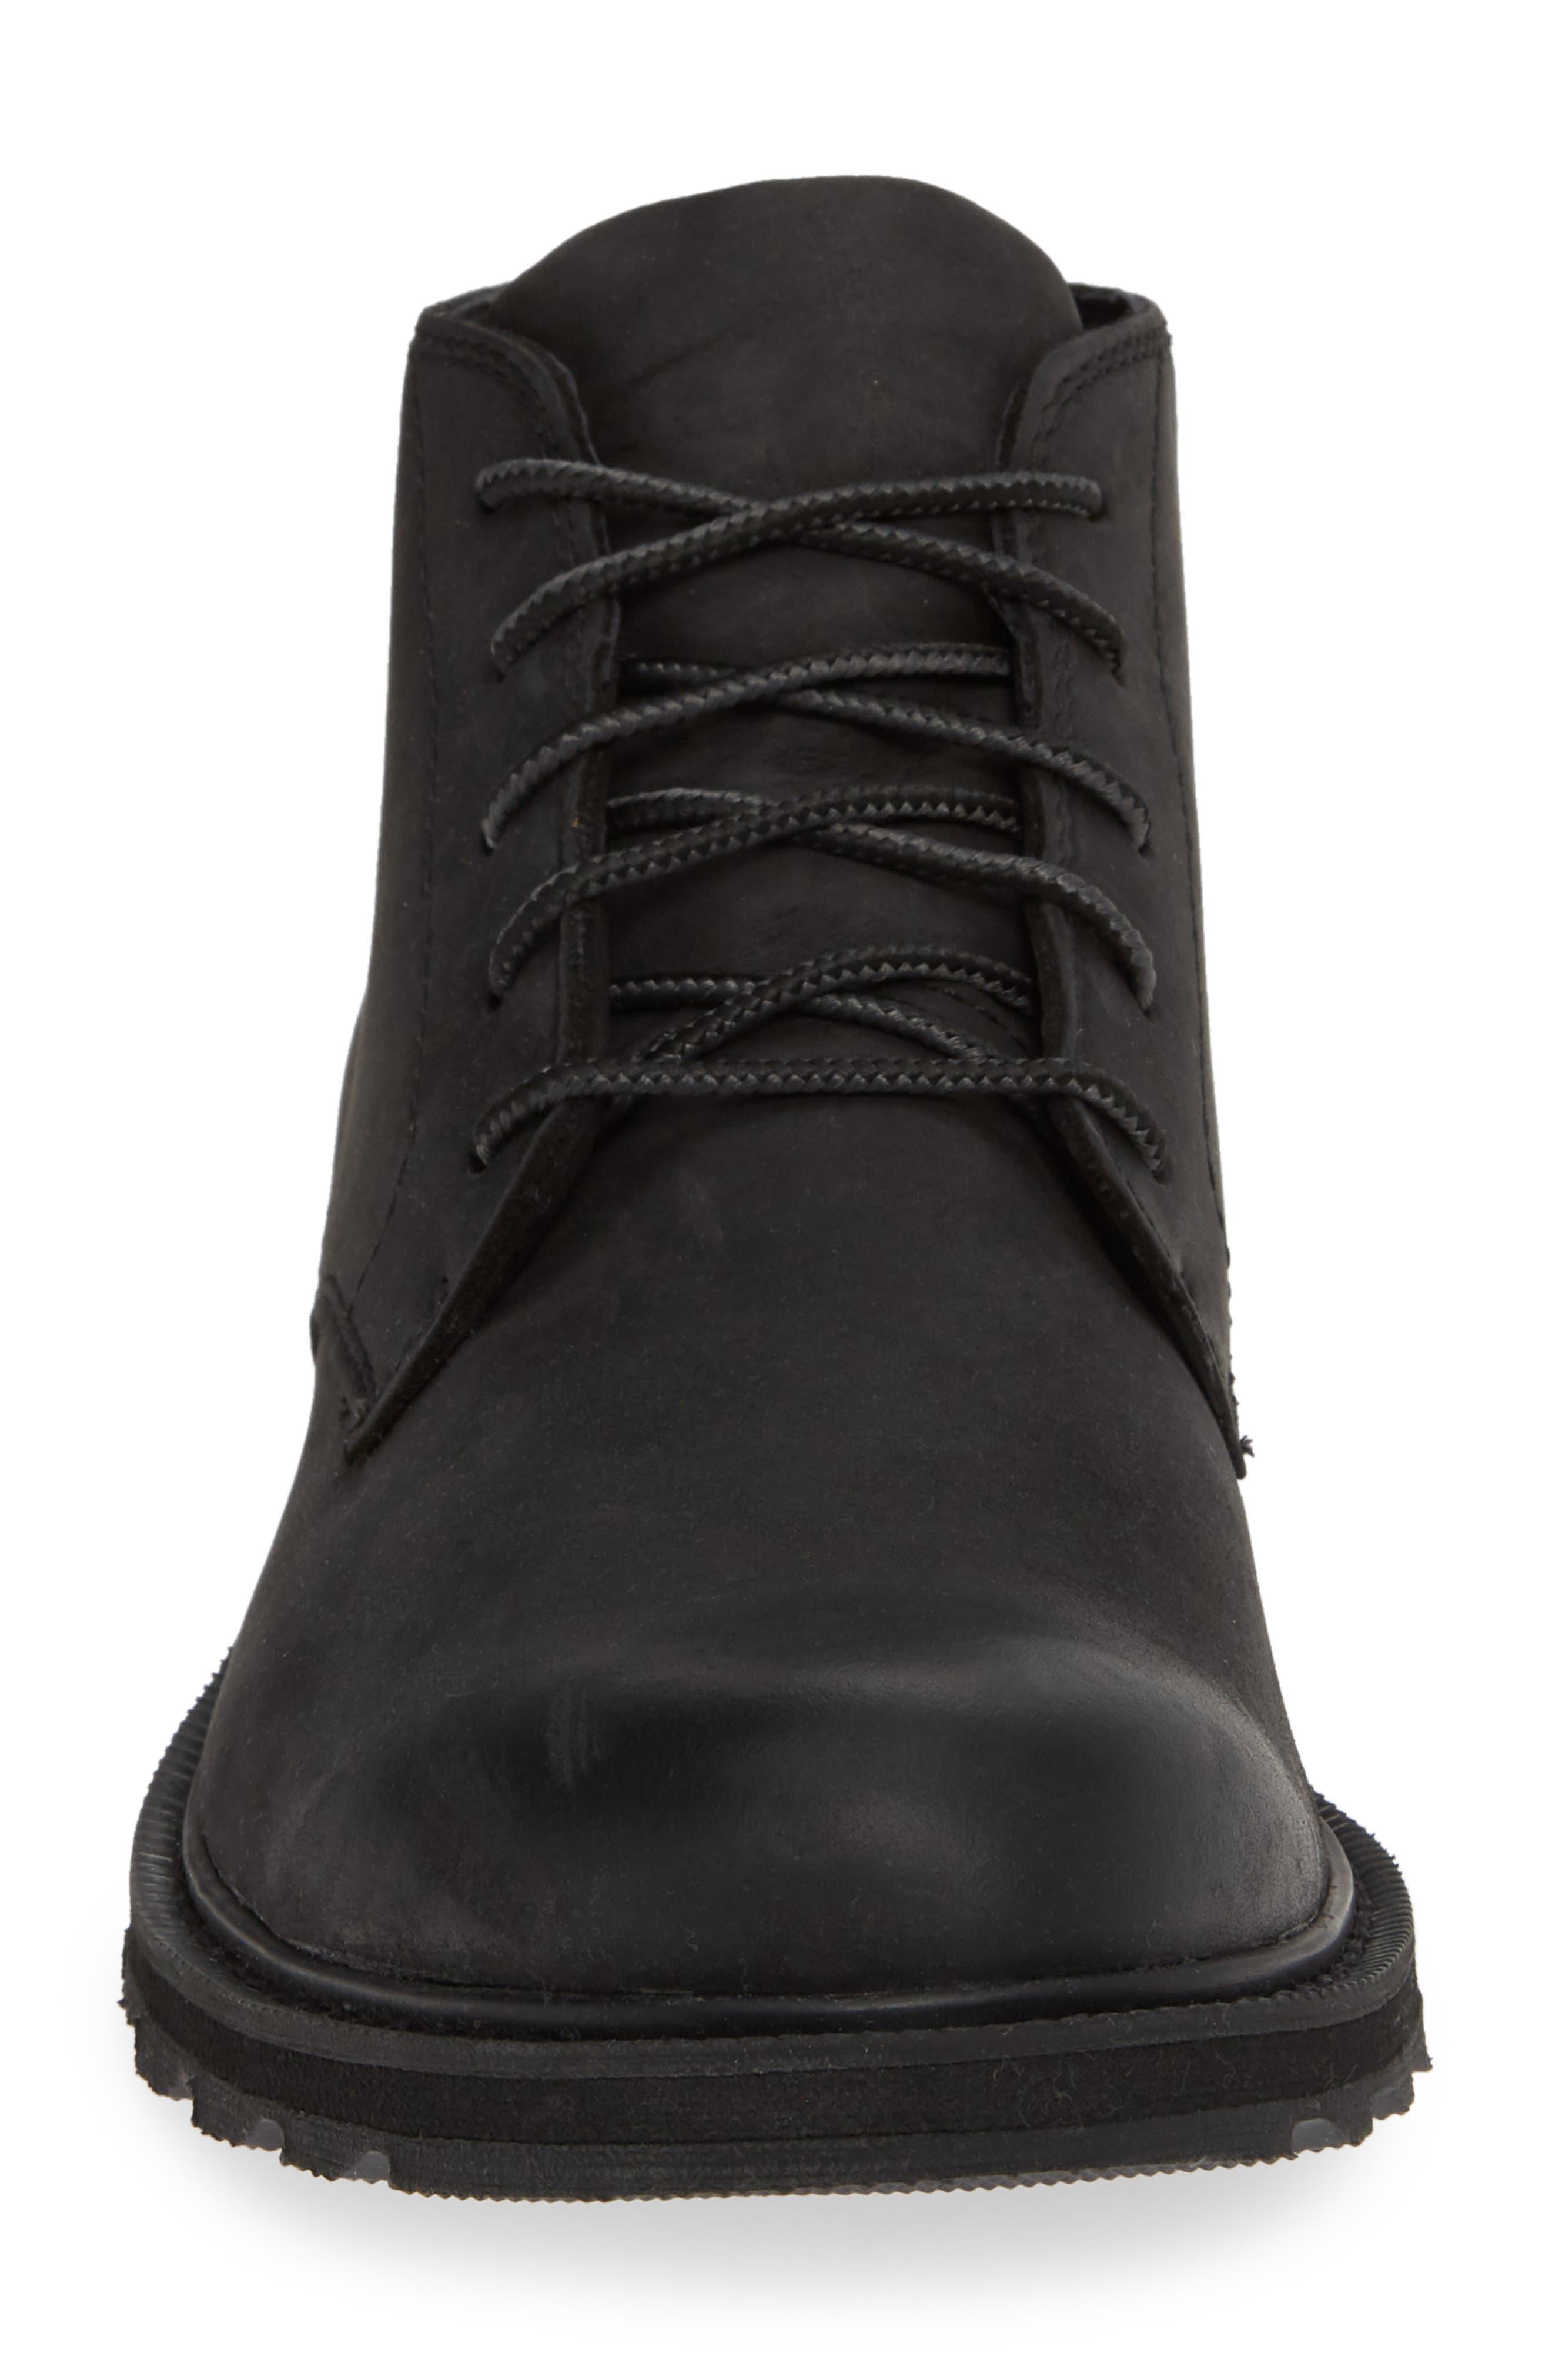 Madson Waterproof Boot,                             Alternate thumbnail 4, color,                             BLACK/ BLACK